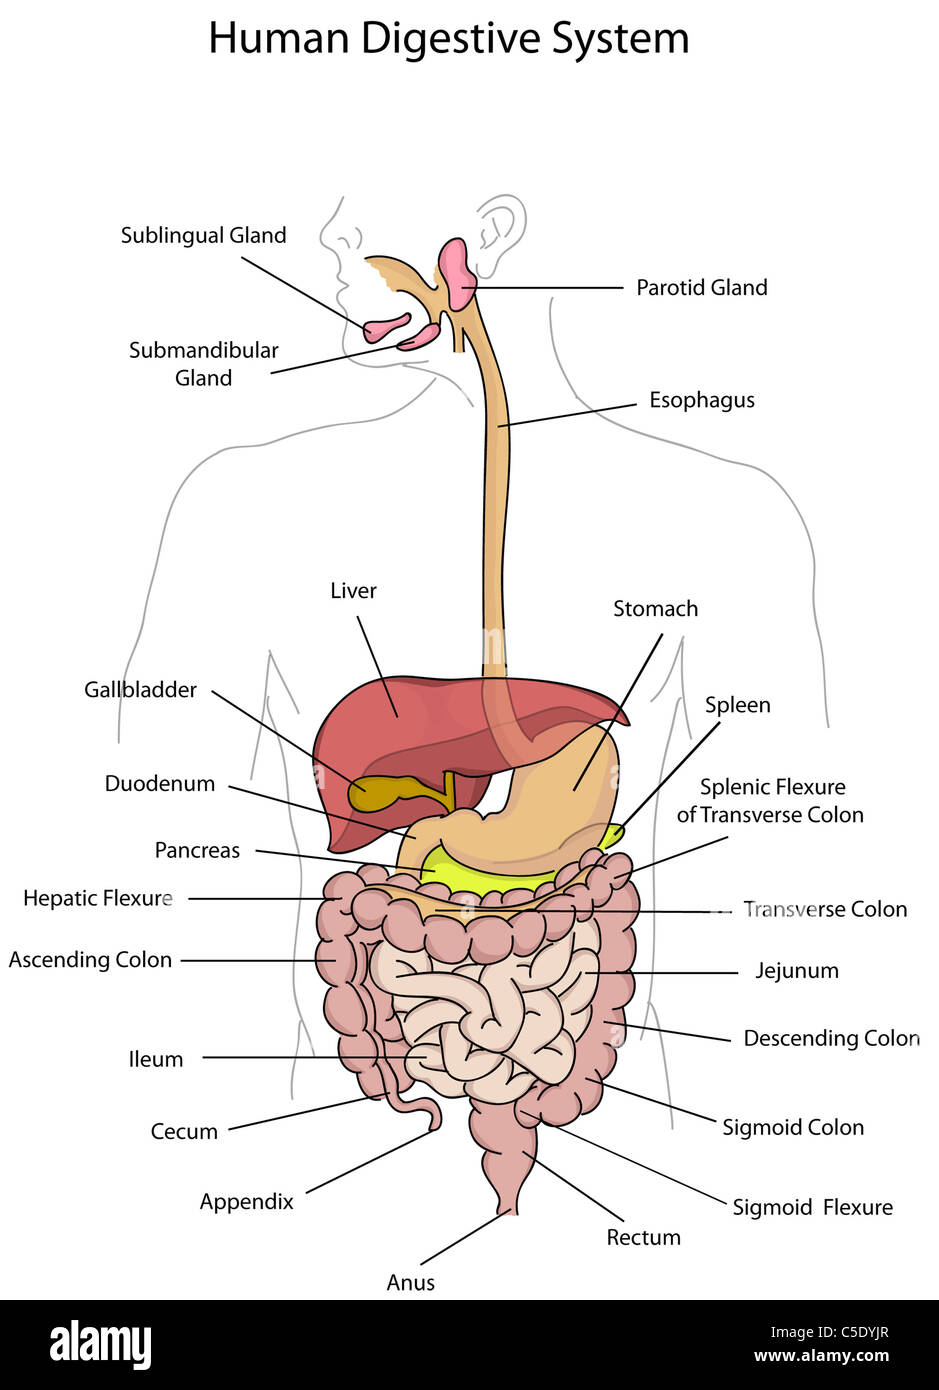 Digestive System Illustration Stock Photos Digestive System